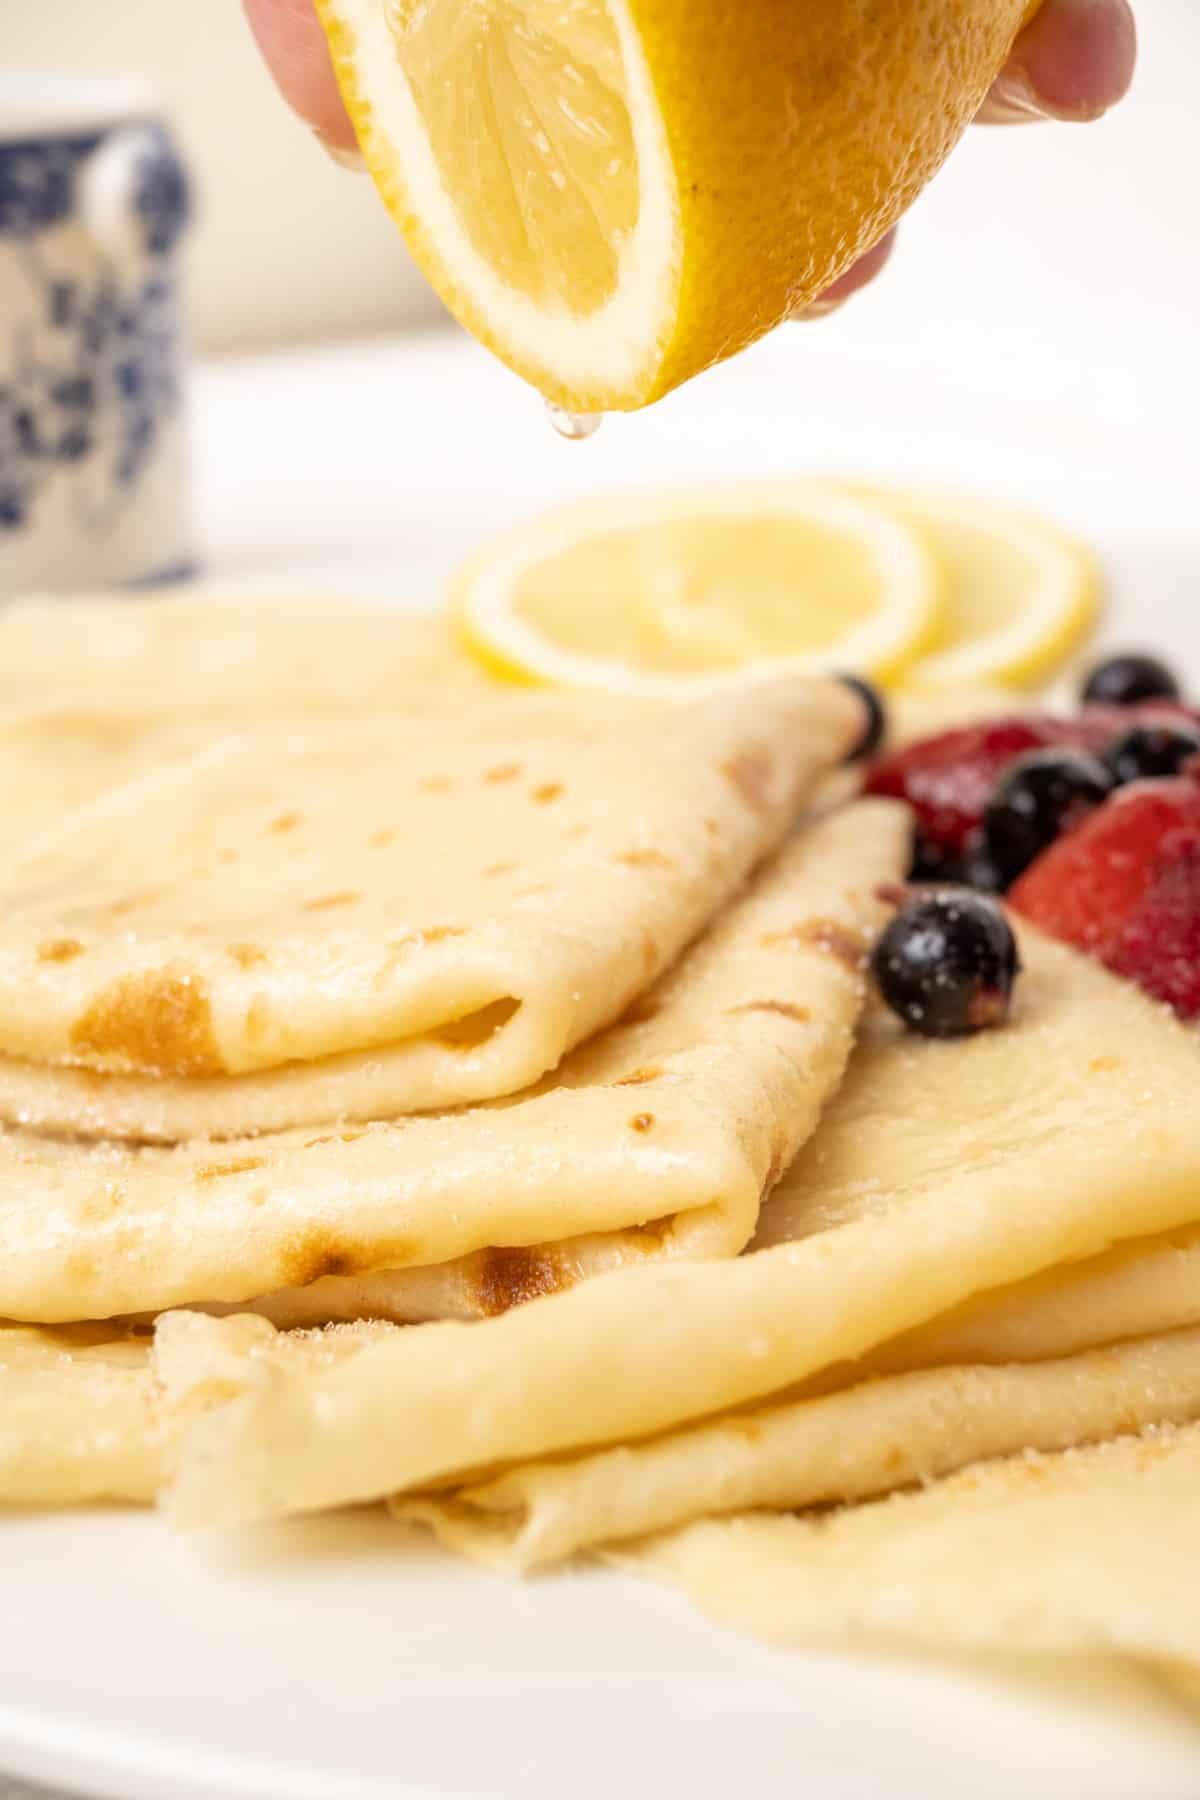 Squeezing lemon onto a pile of thin pancakes.